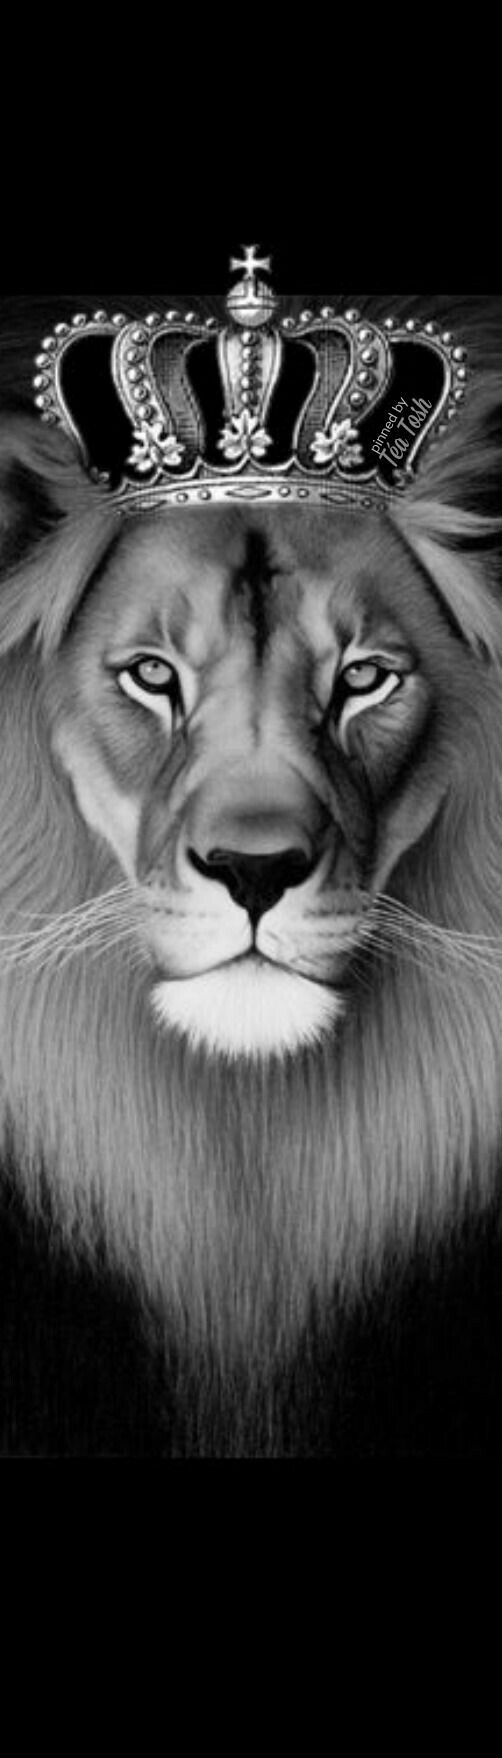 best leão preto e branco images on pinterest